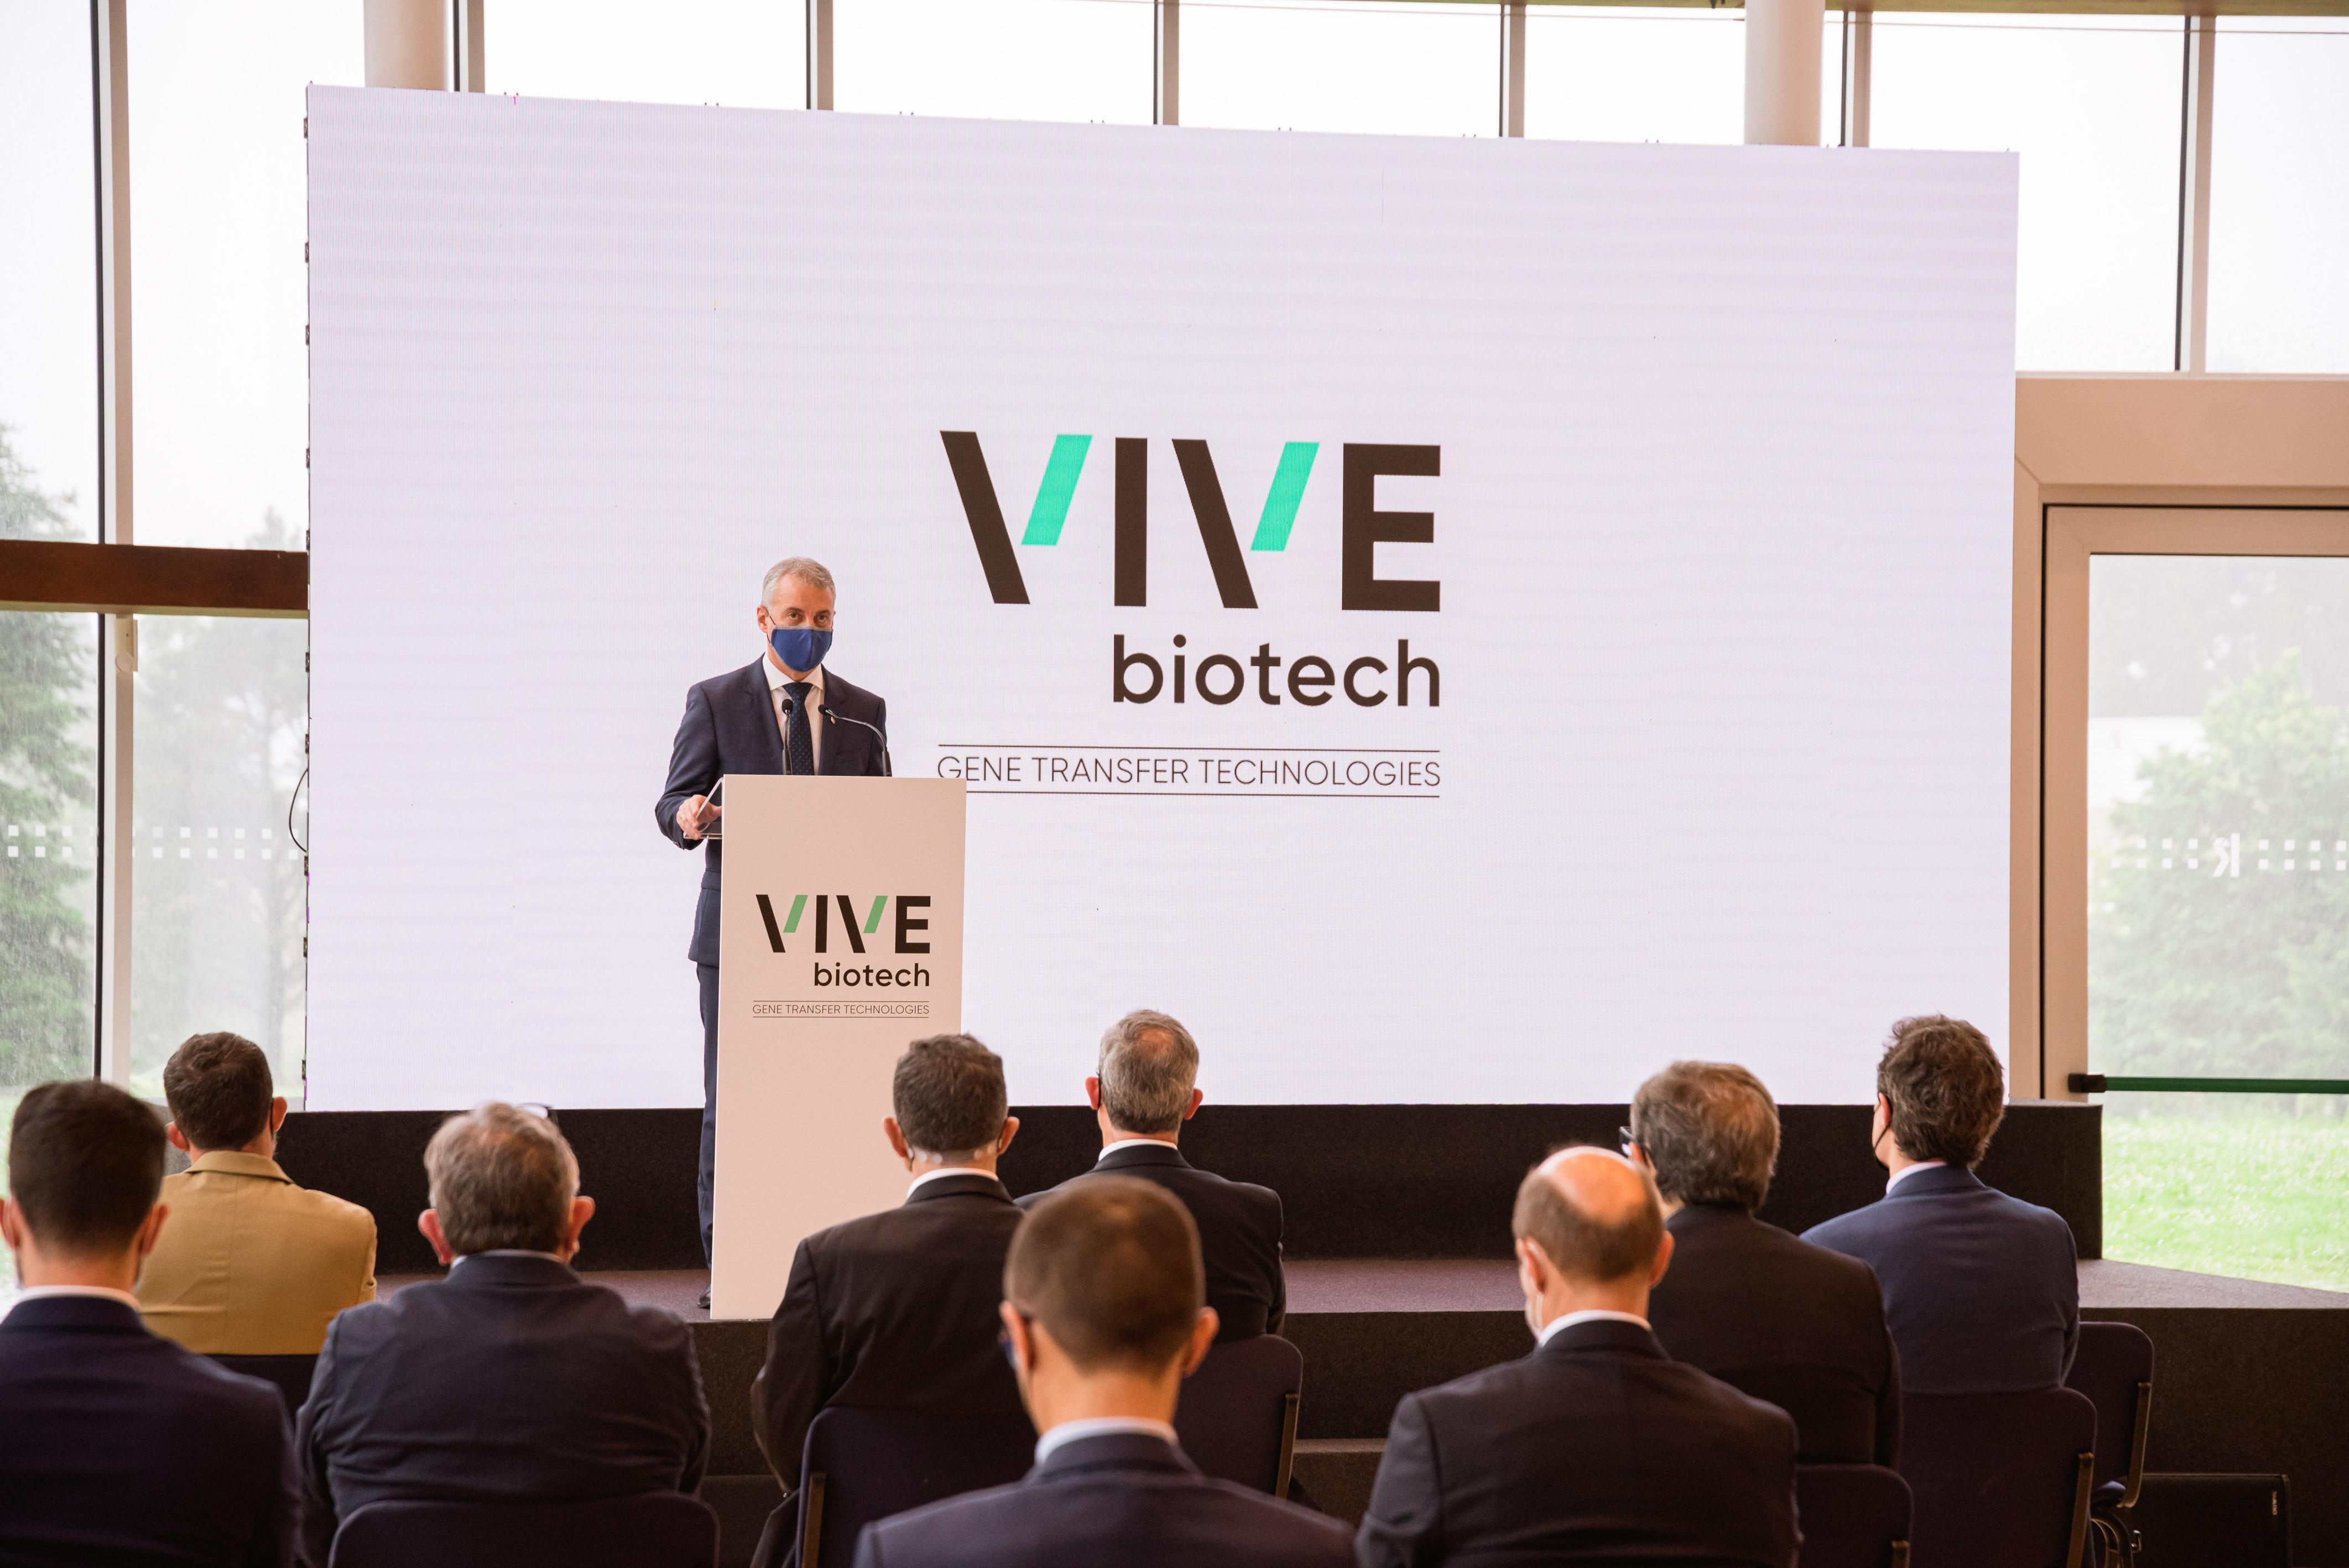 vivebiotech_donosti4-6-2021_usual-7953.jpg